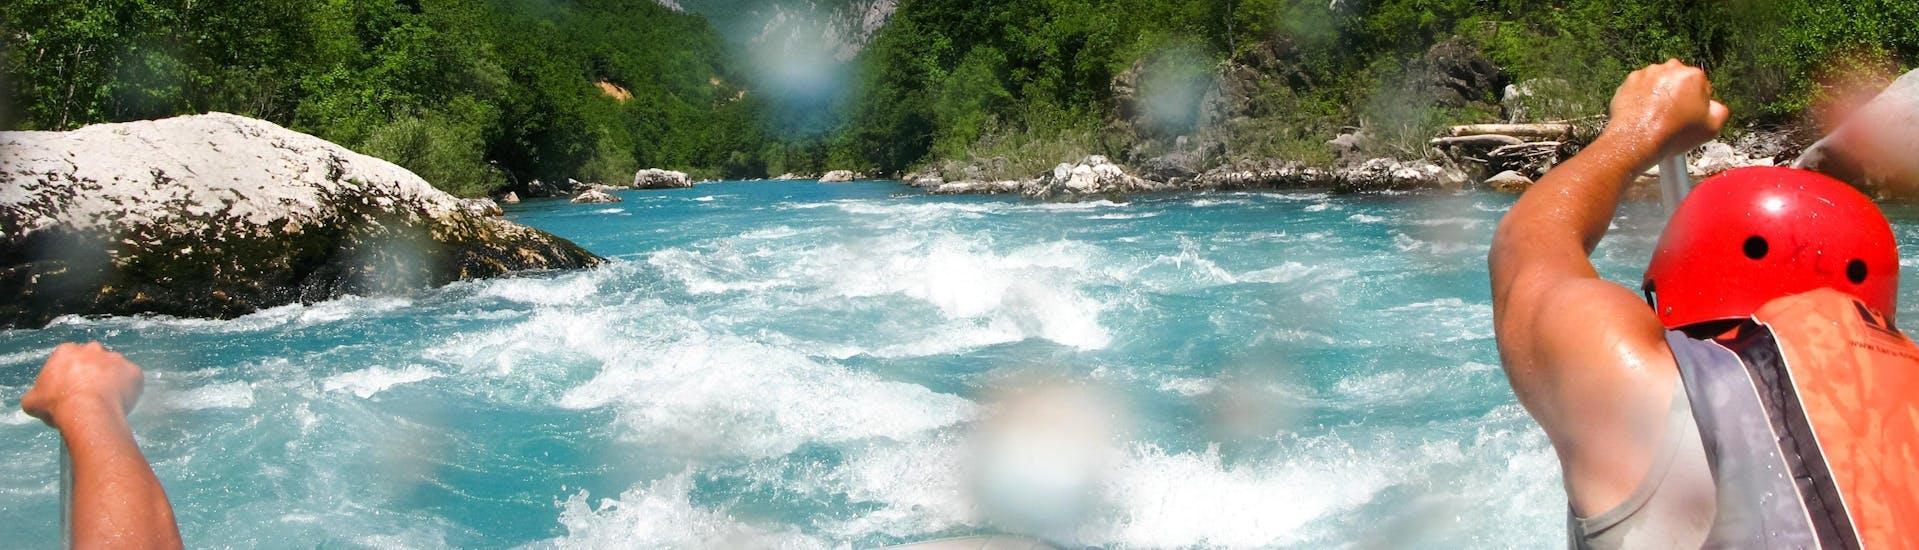 Rafting Canyoning Fotolia